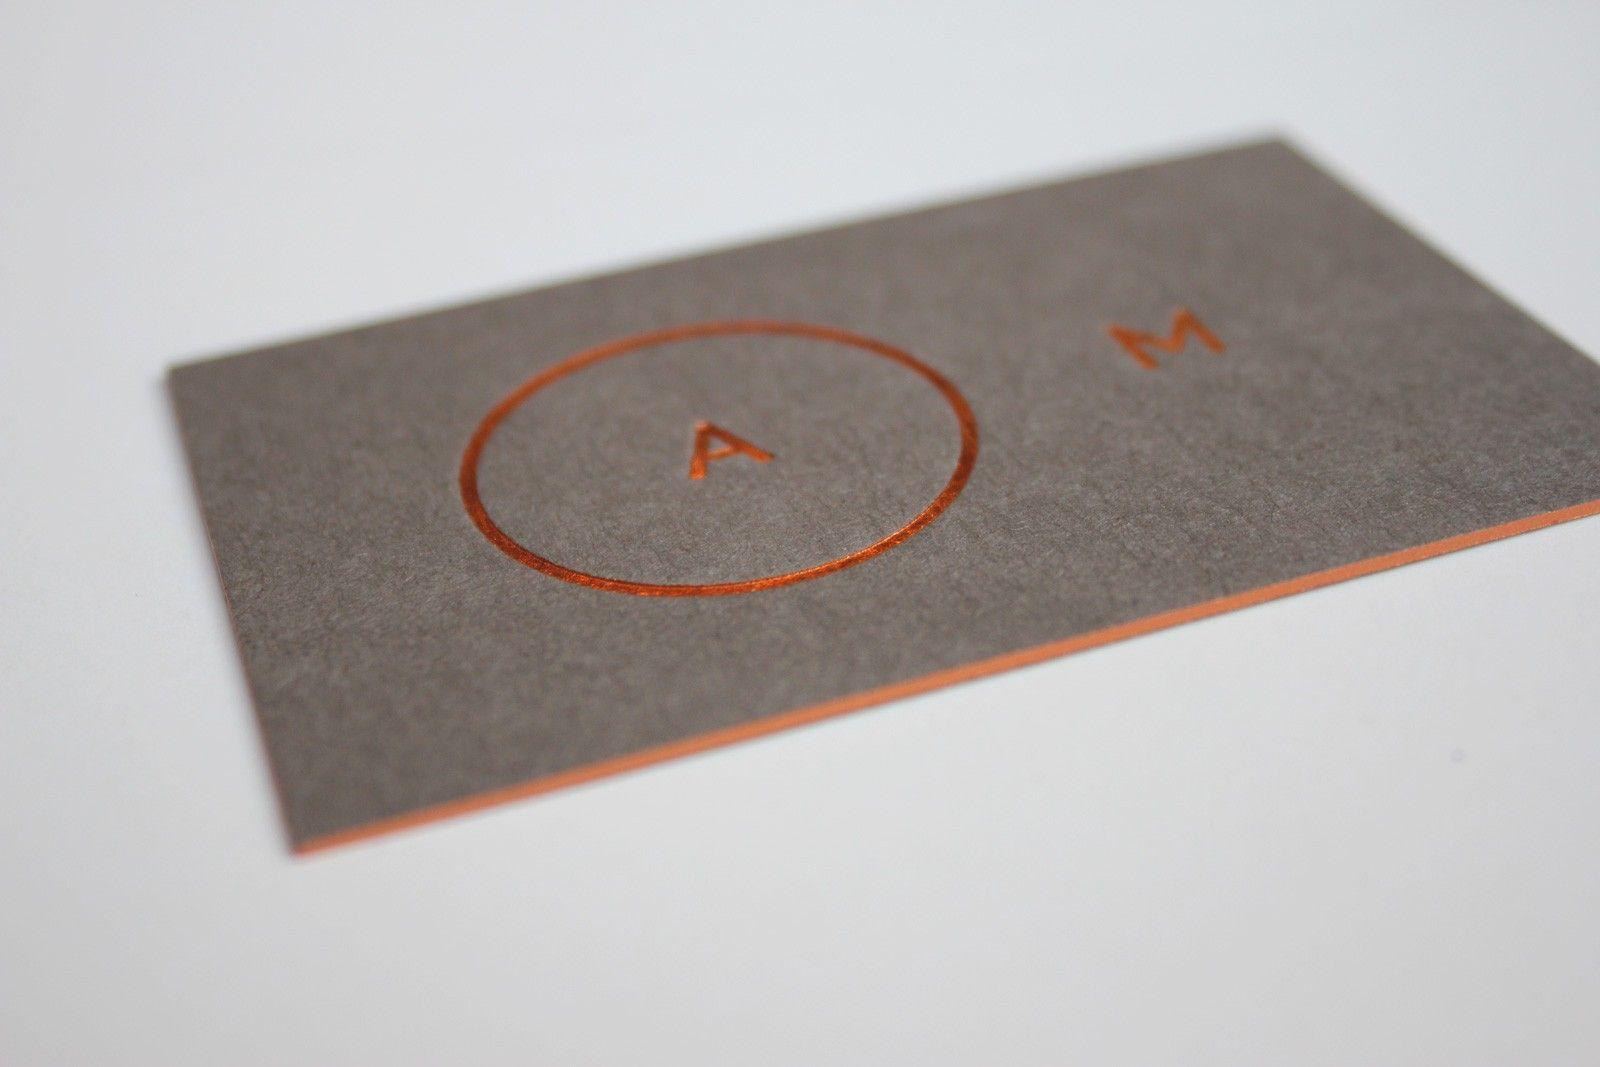 Impressive Hot Foil Stamped Business Cards You Should See | Business ...